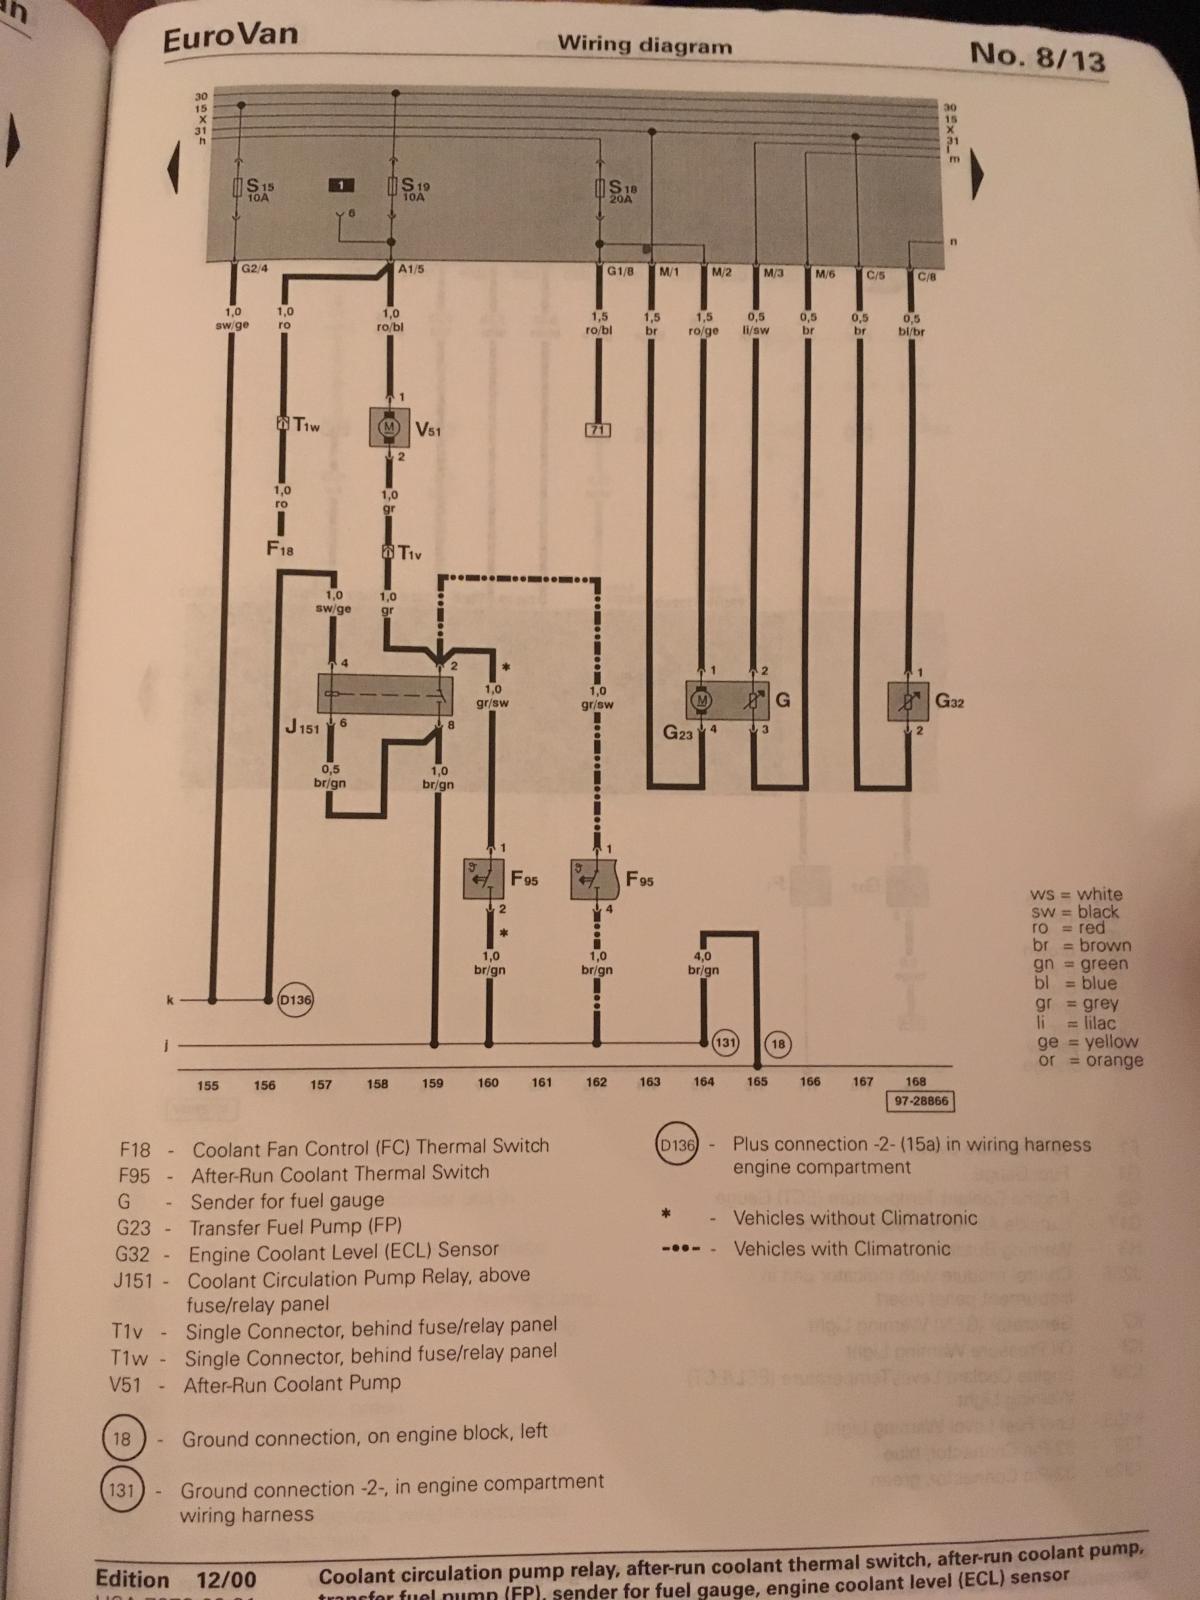 99 Eurovan Wiring Diagram Reveolution Of 1999 Vw Ac Thesamba Com Gallery After Run Pump Rh 1993 Water Replacement